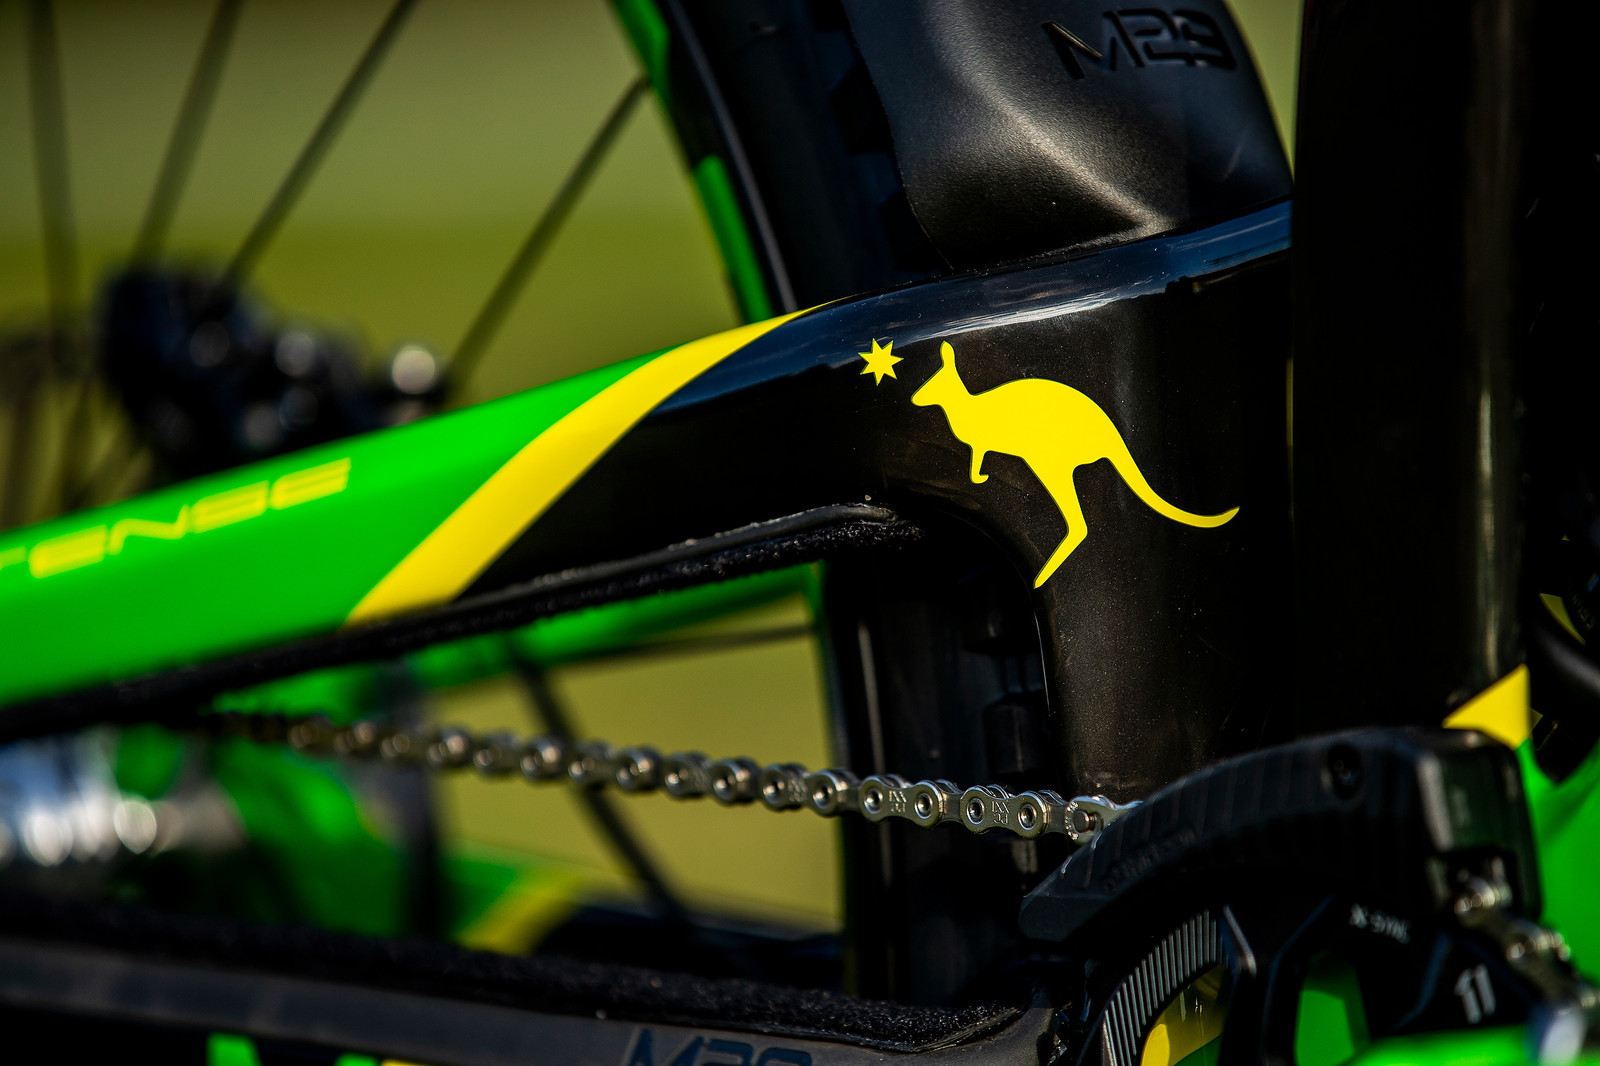 Roo Power - WORLD CHAMPS BIKE - Jack Moir's Intense M29 - Mountain Biking Pictures - Vital MTB